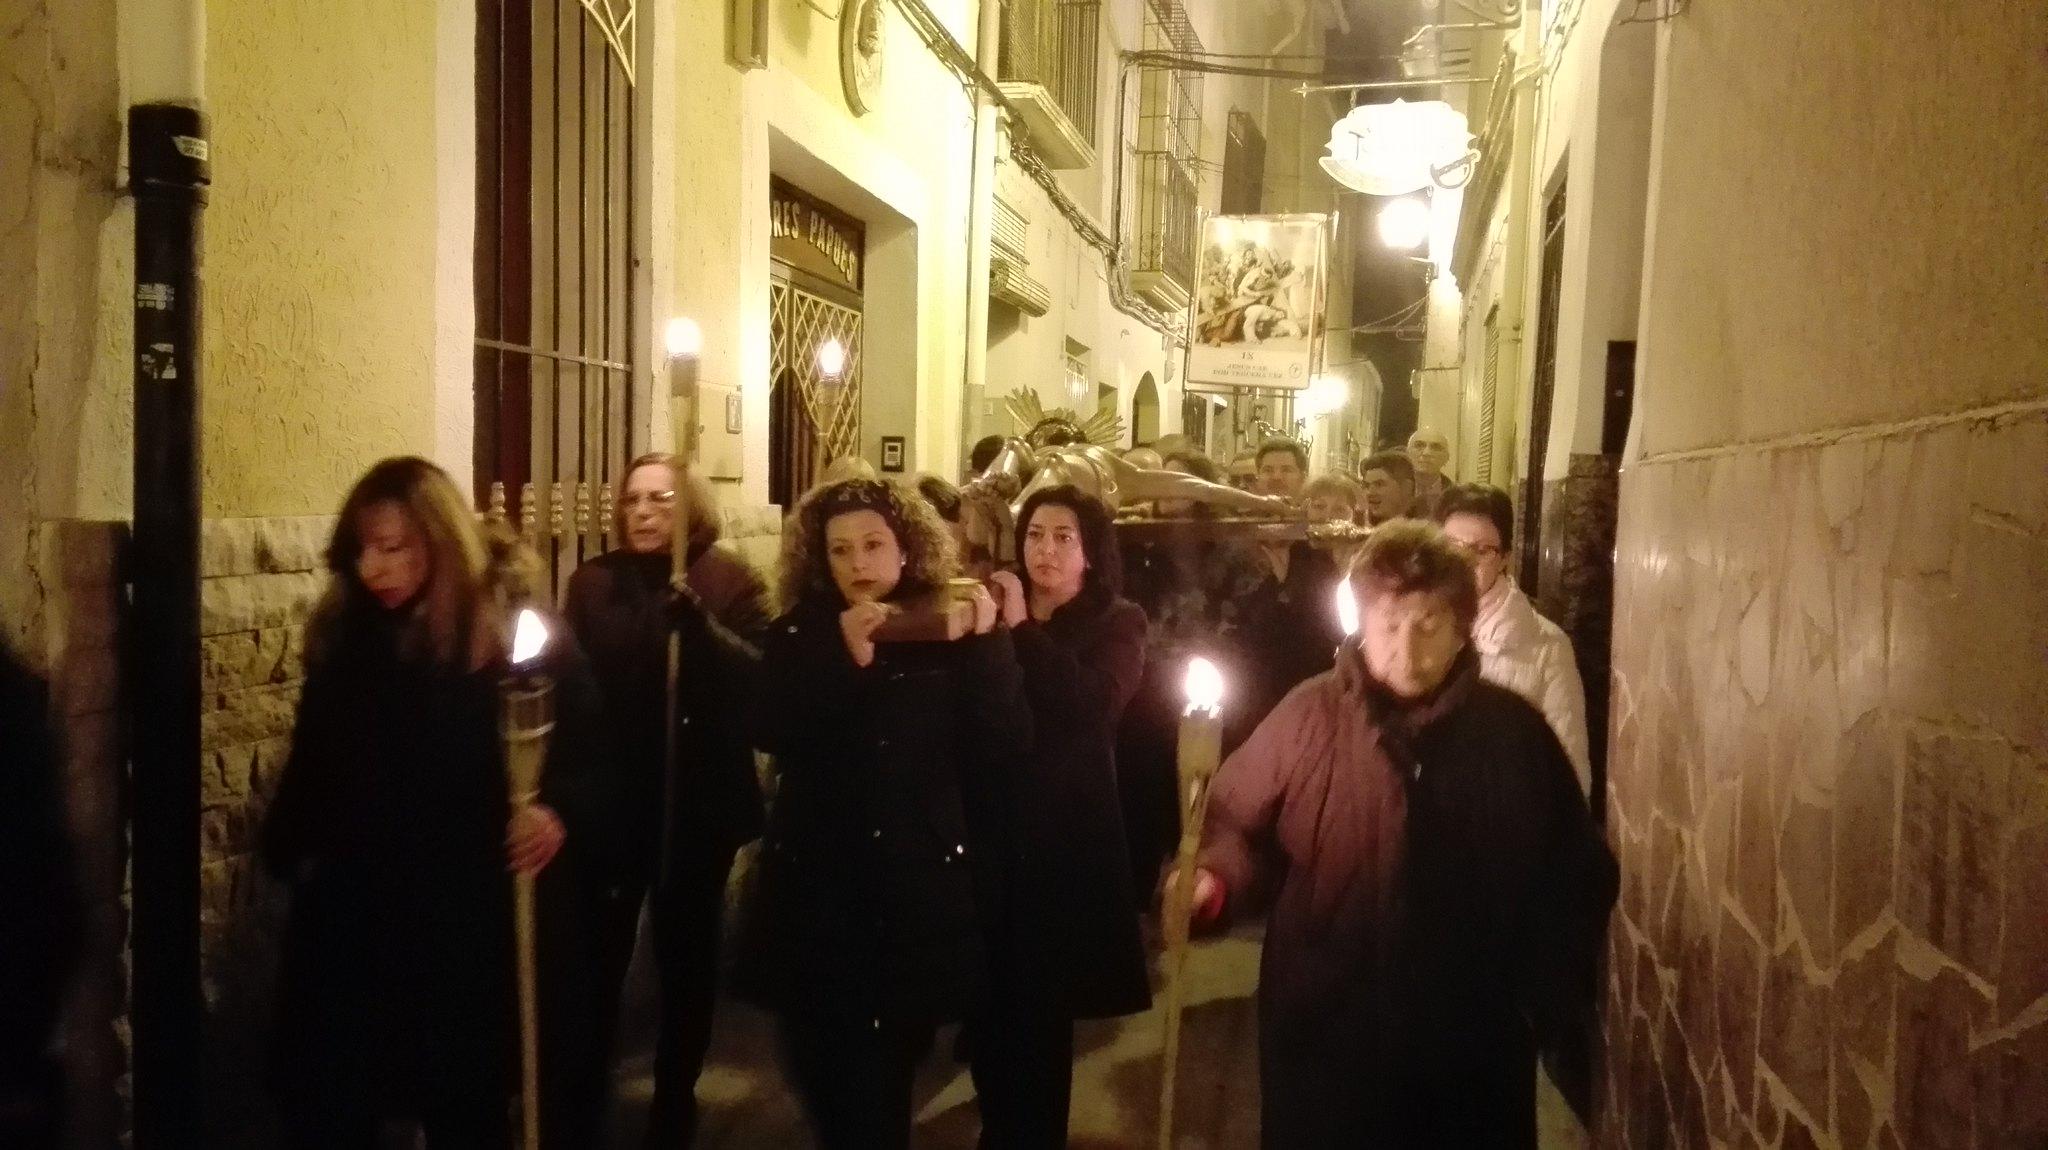 (2016-03-18) - VII Vía Crucis nocturno - Javier Romero Ripoll (091)